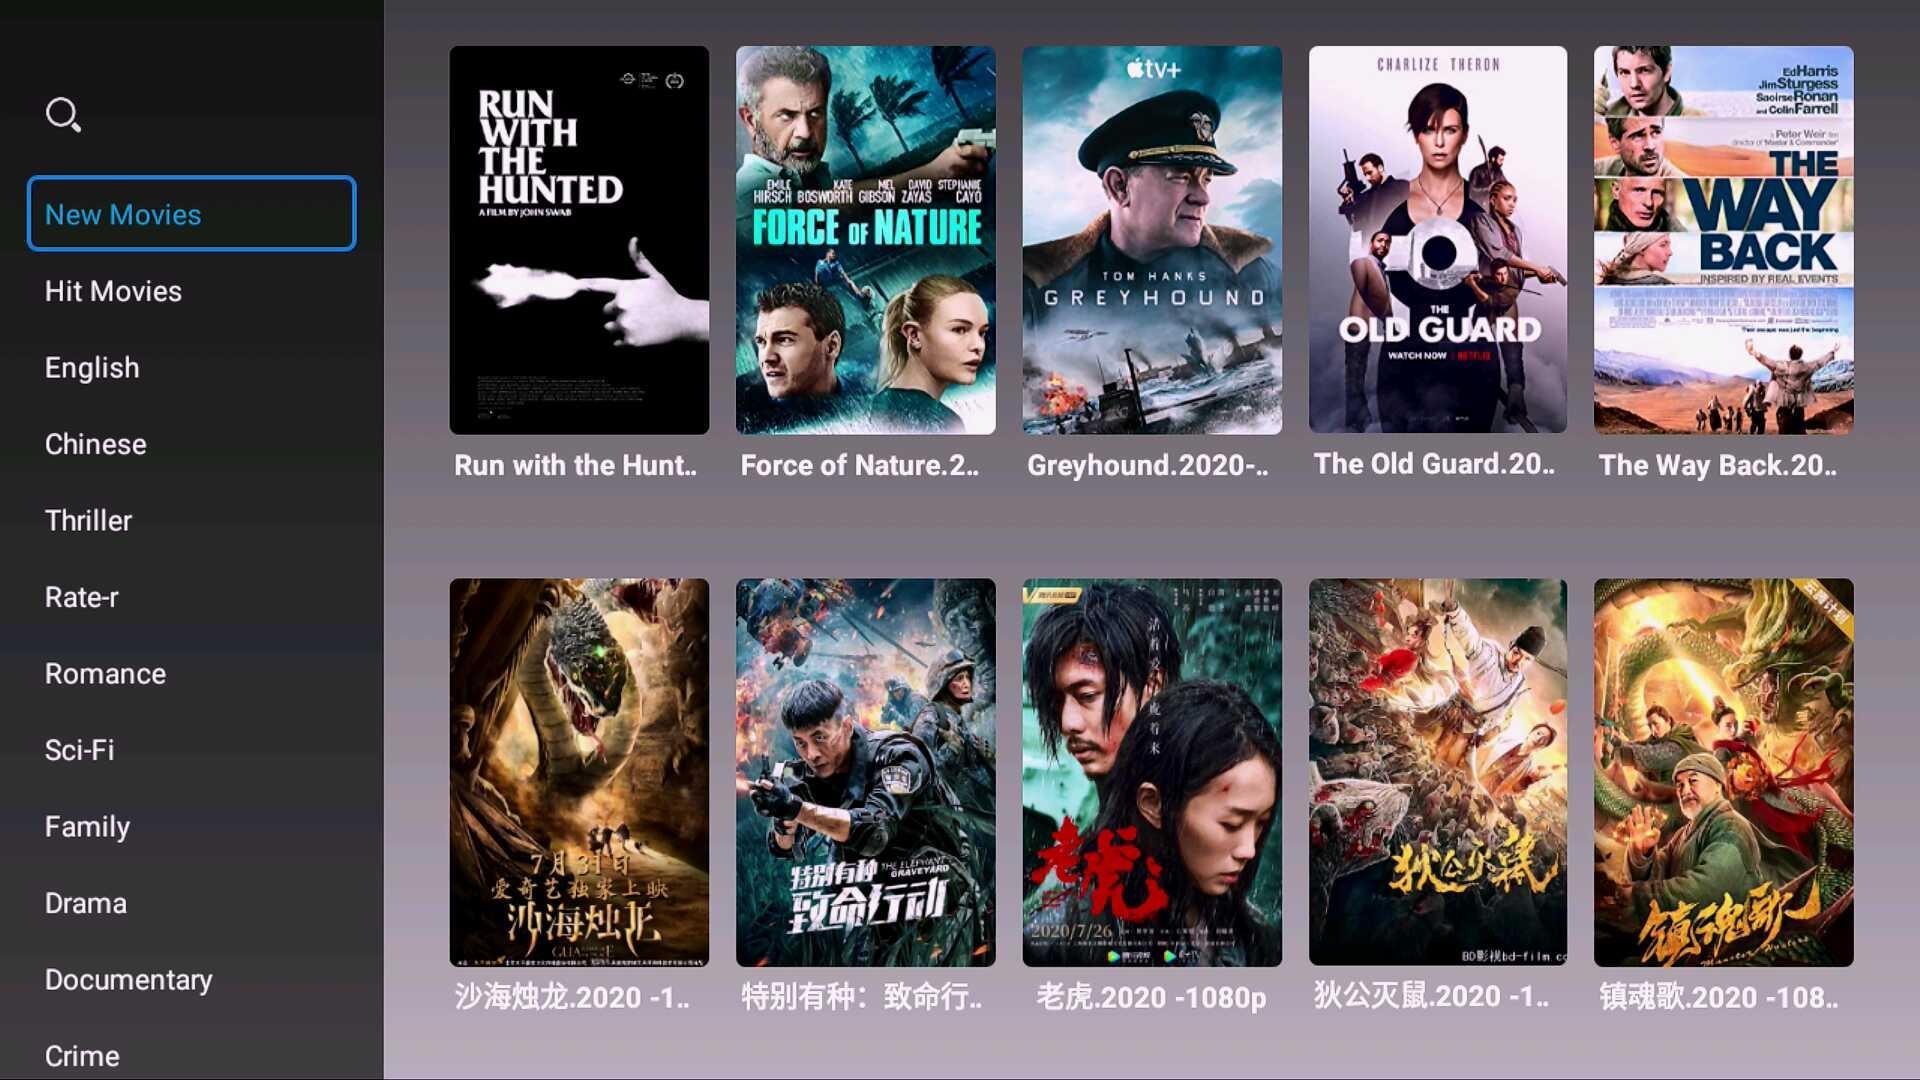 2020 latest Singapore Malaysia tv box iFibre Cloud all Starhub tv channels astro 16